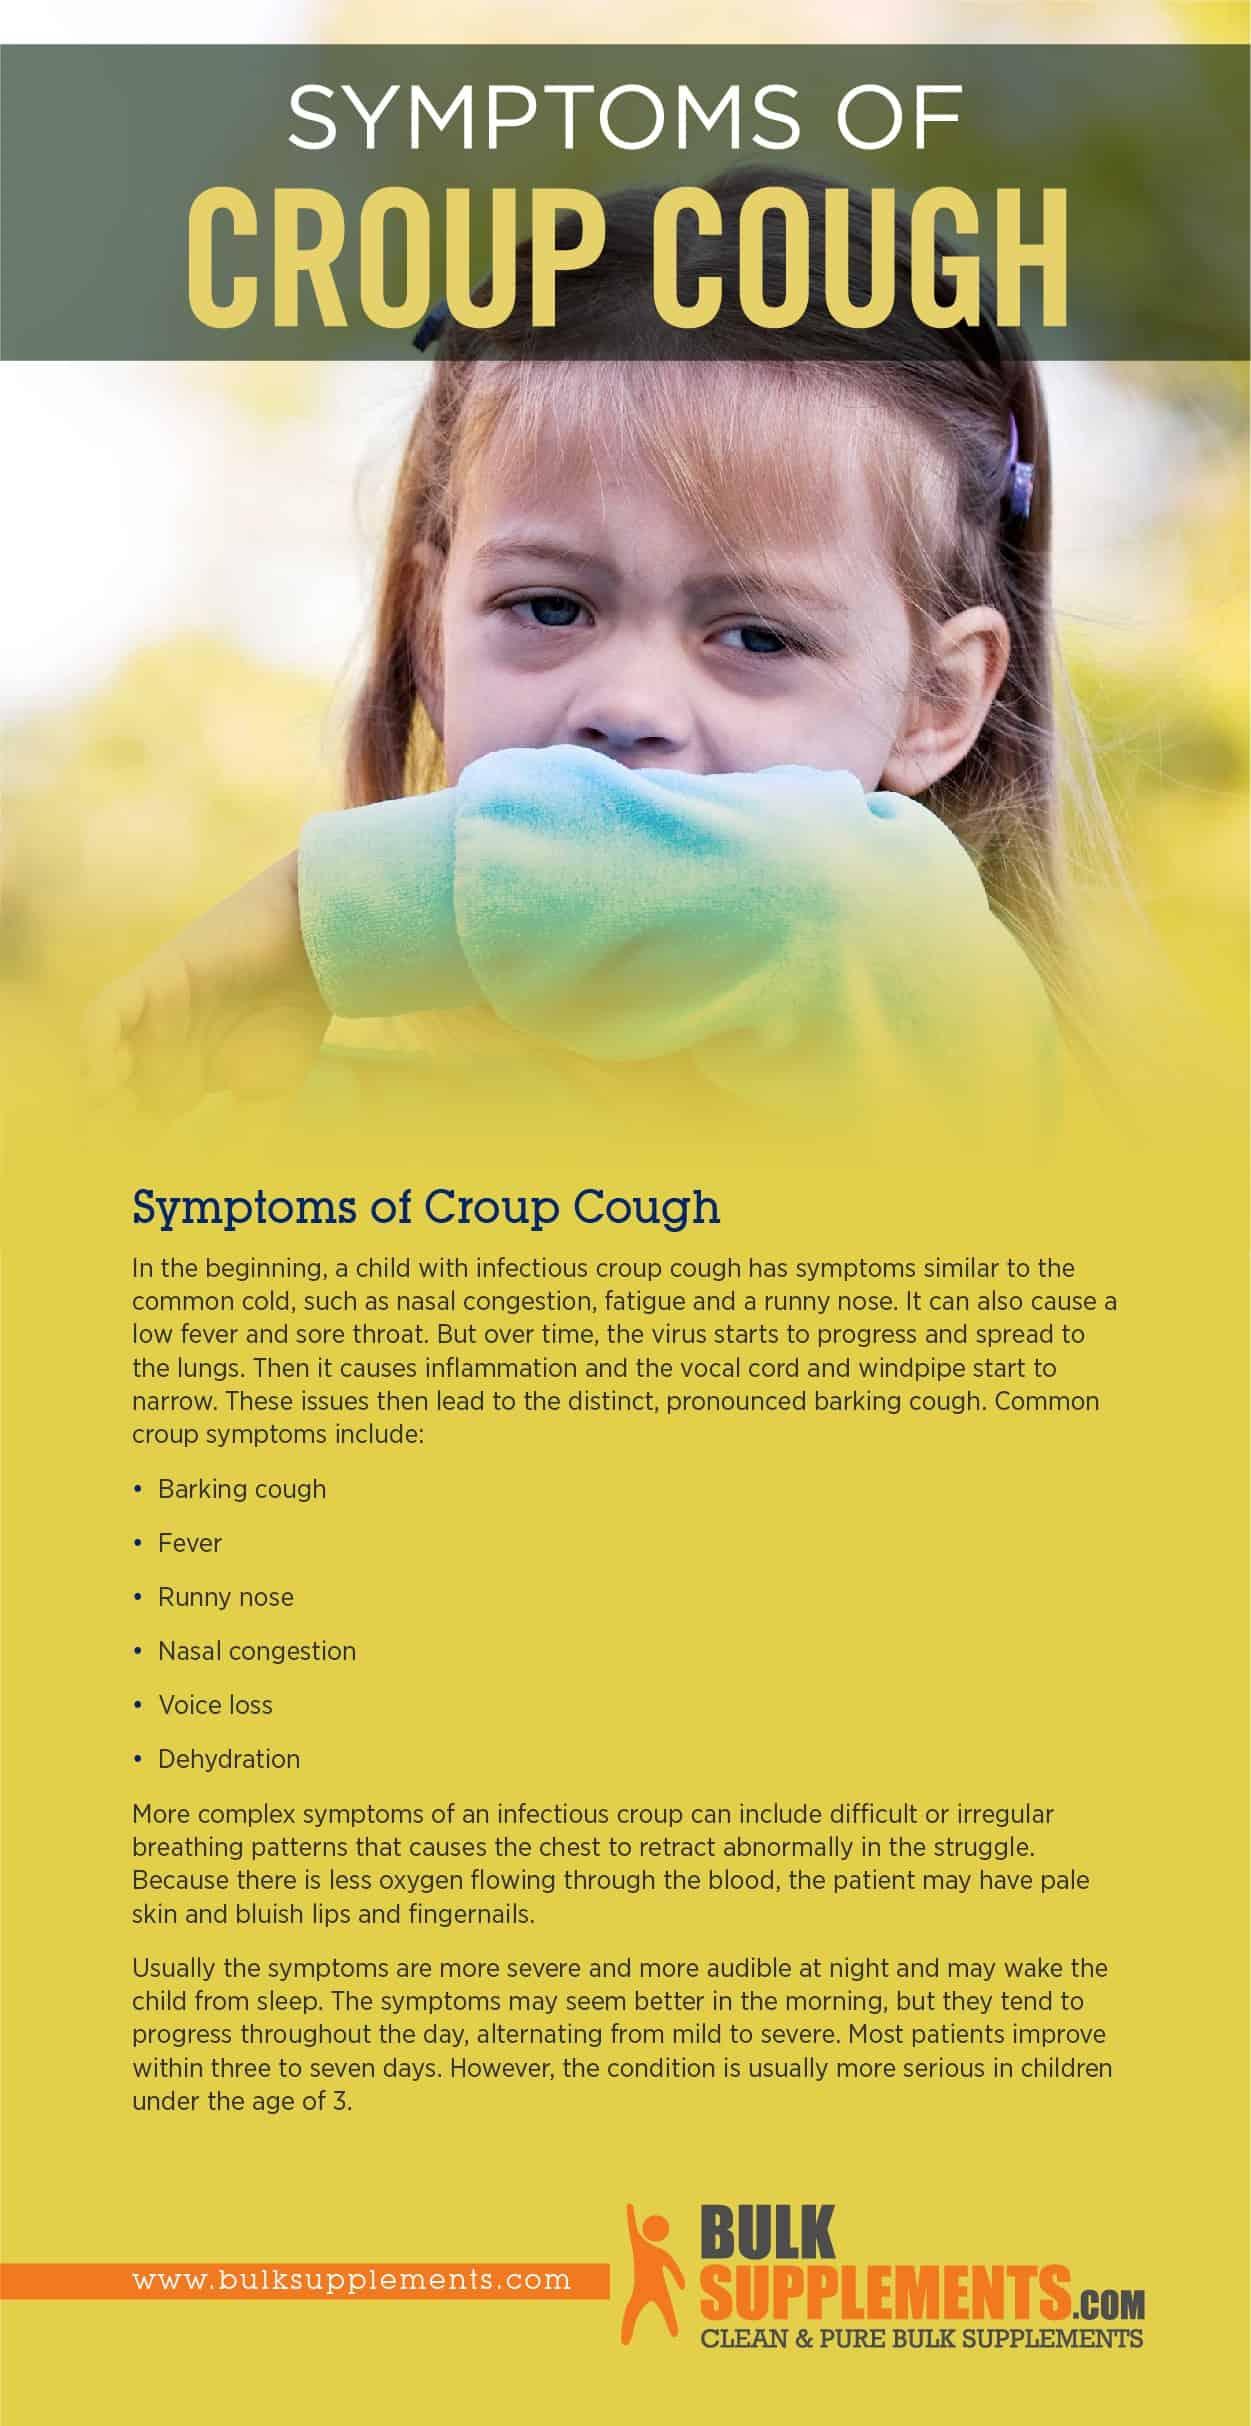 Symptoms of Croup Cough